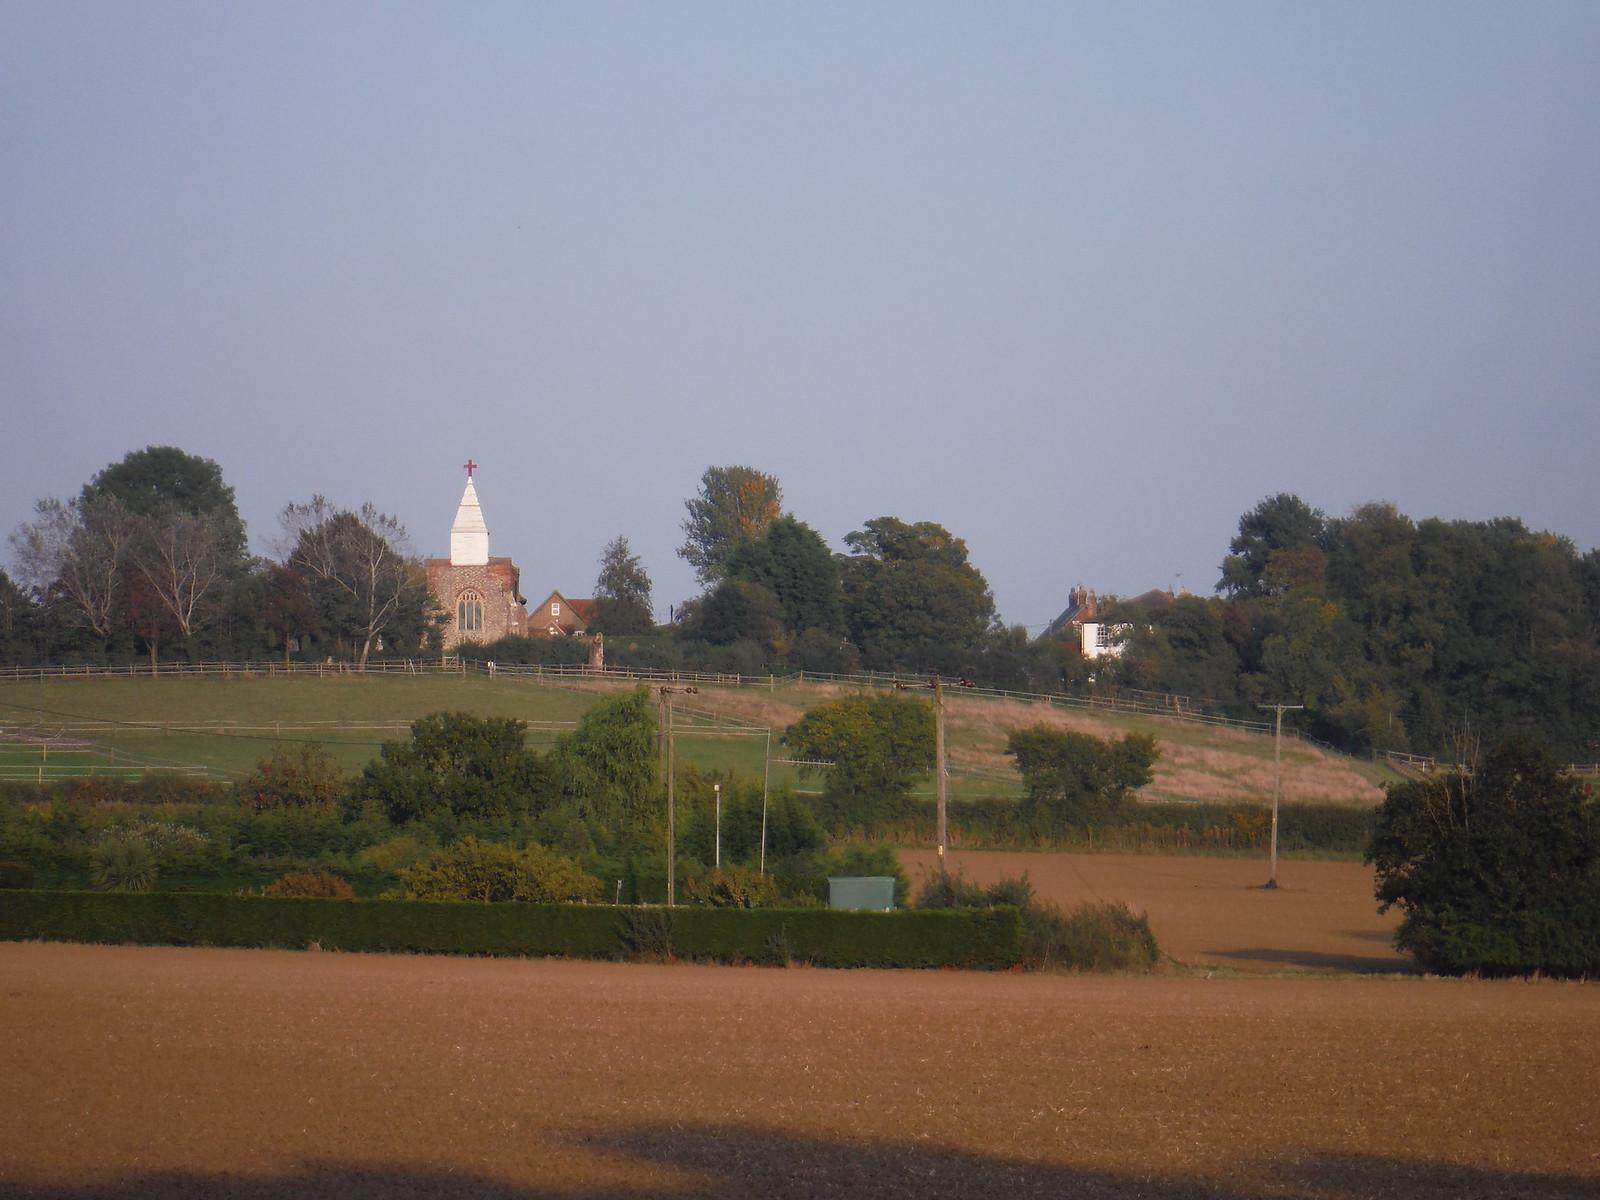 St. Mary & St. Margaret Church, Stow Maries SWC Walk 159 South Woodham Ferrers to North Fambridge